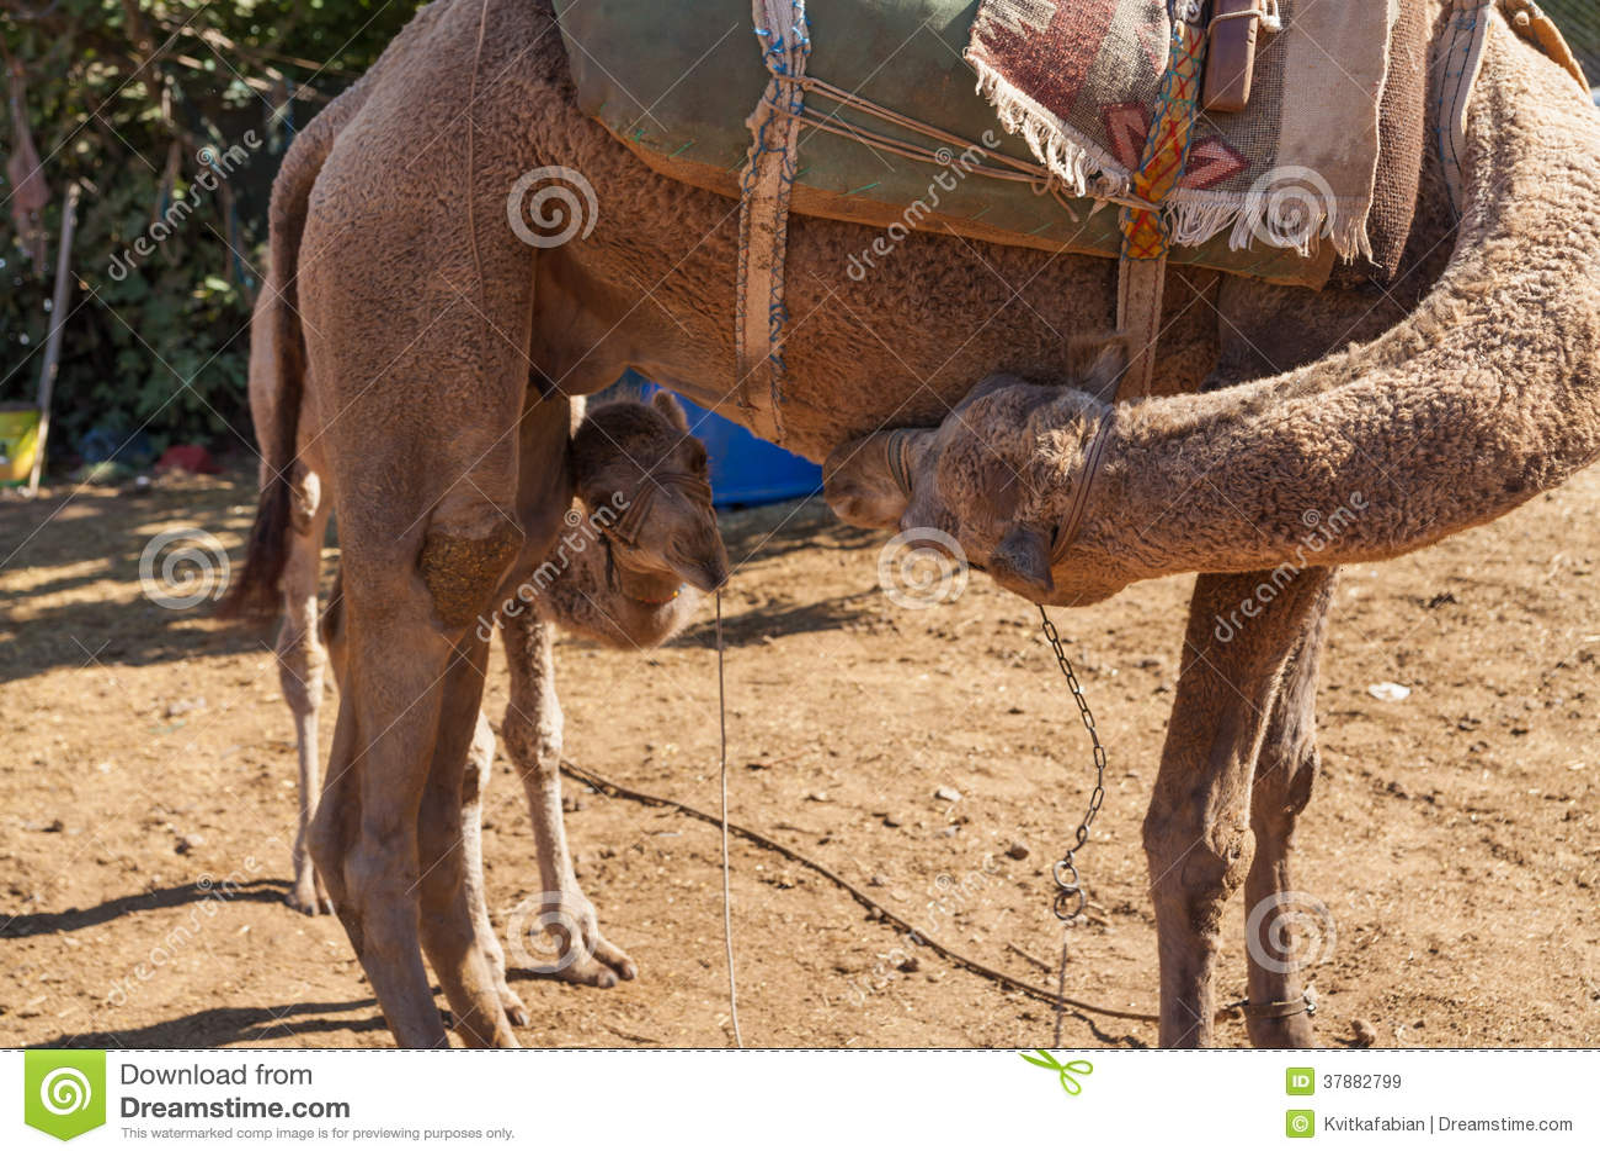 Kleine kameel met haar moeder